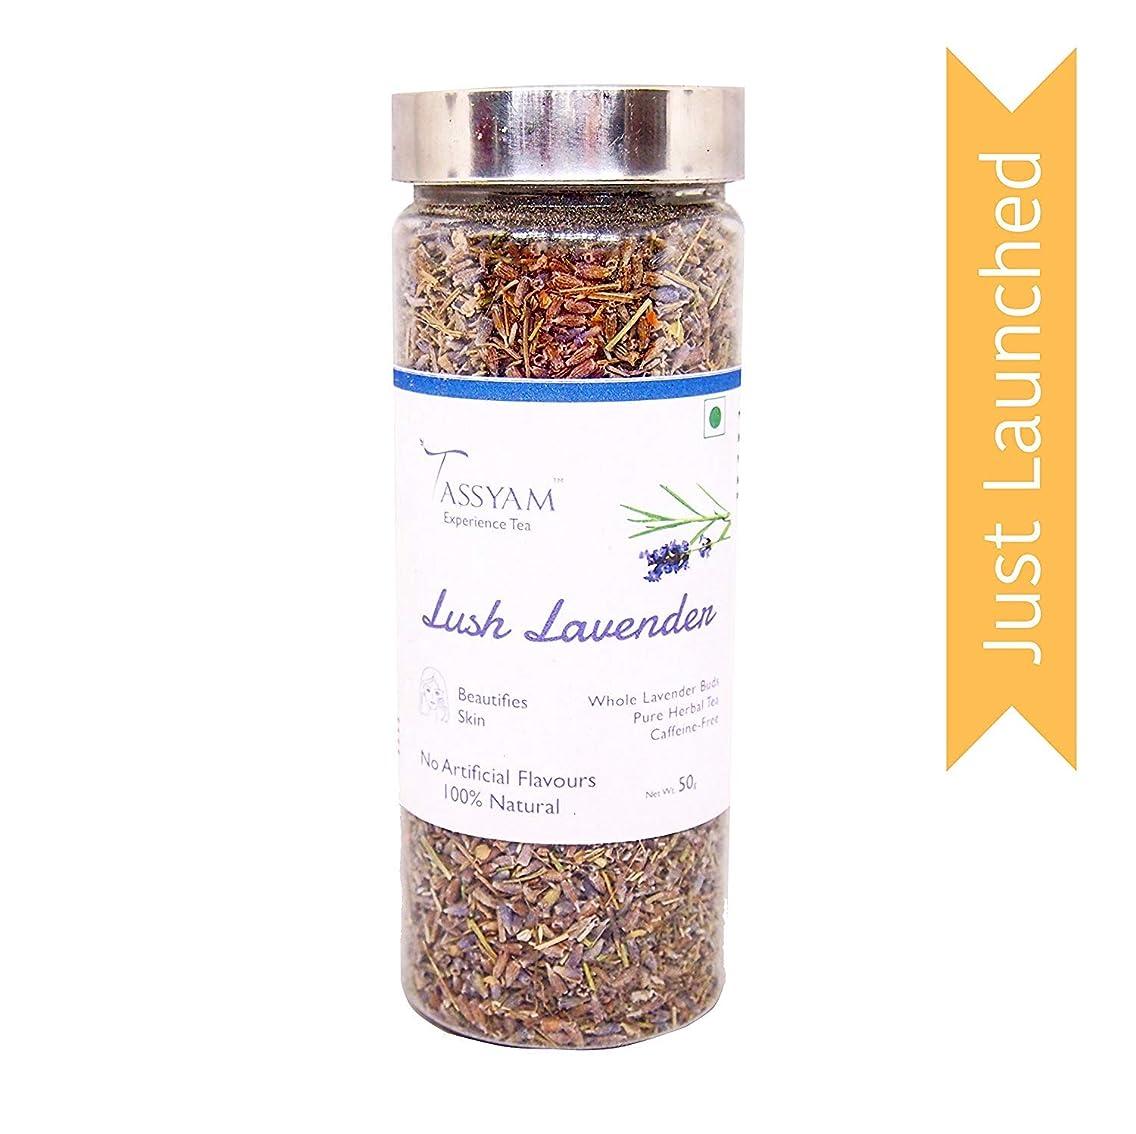 Lush Lavender Buds Whole, Herbal Tea 50grams (1.76 oz) by Tassyam